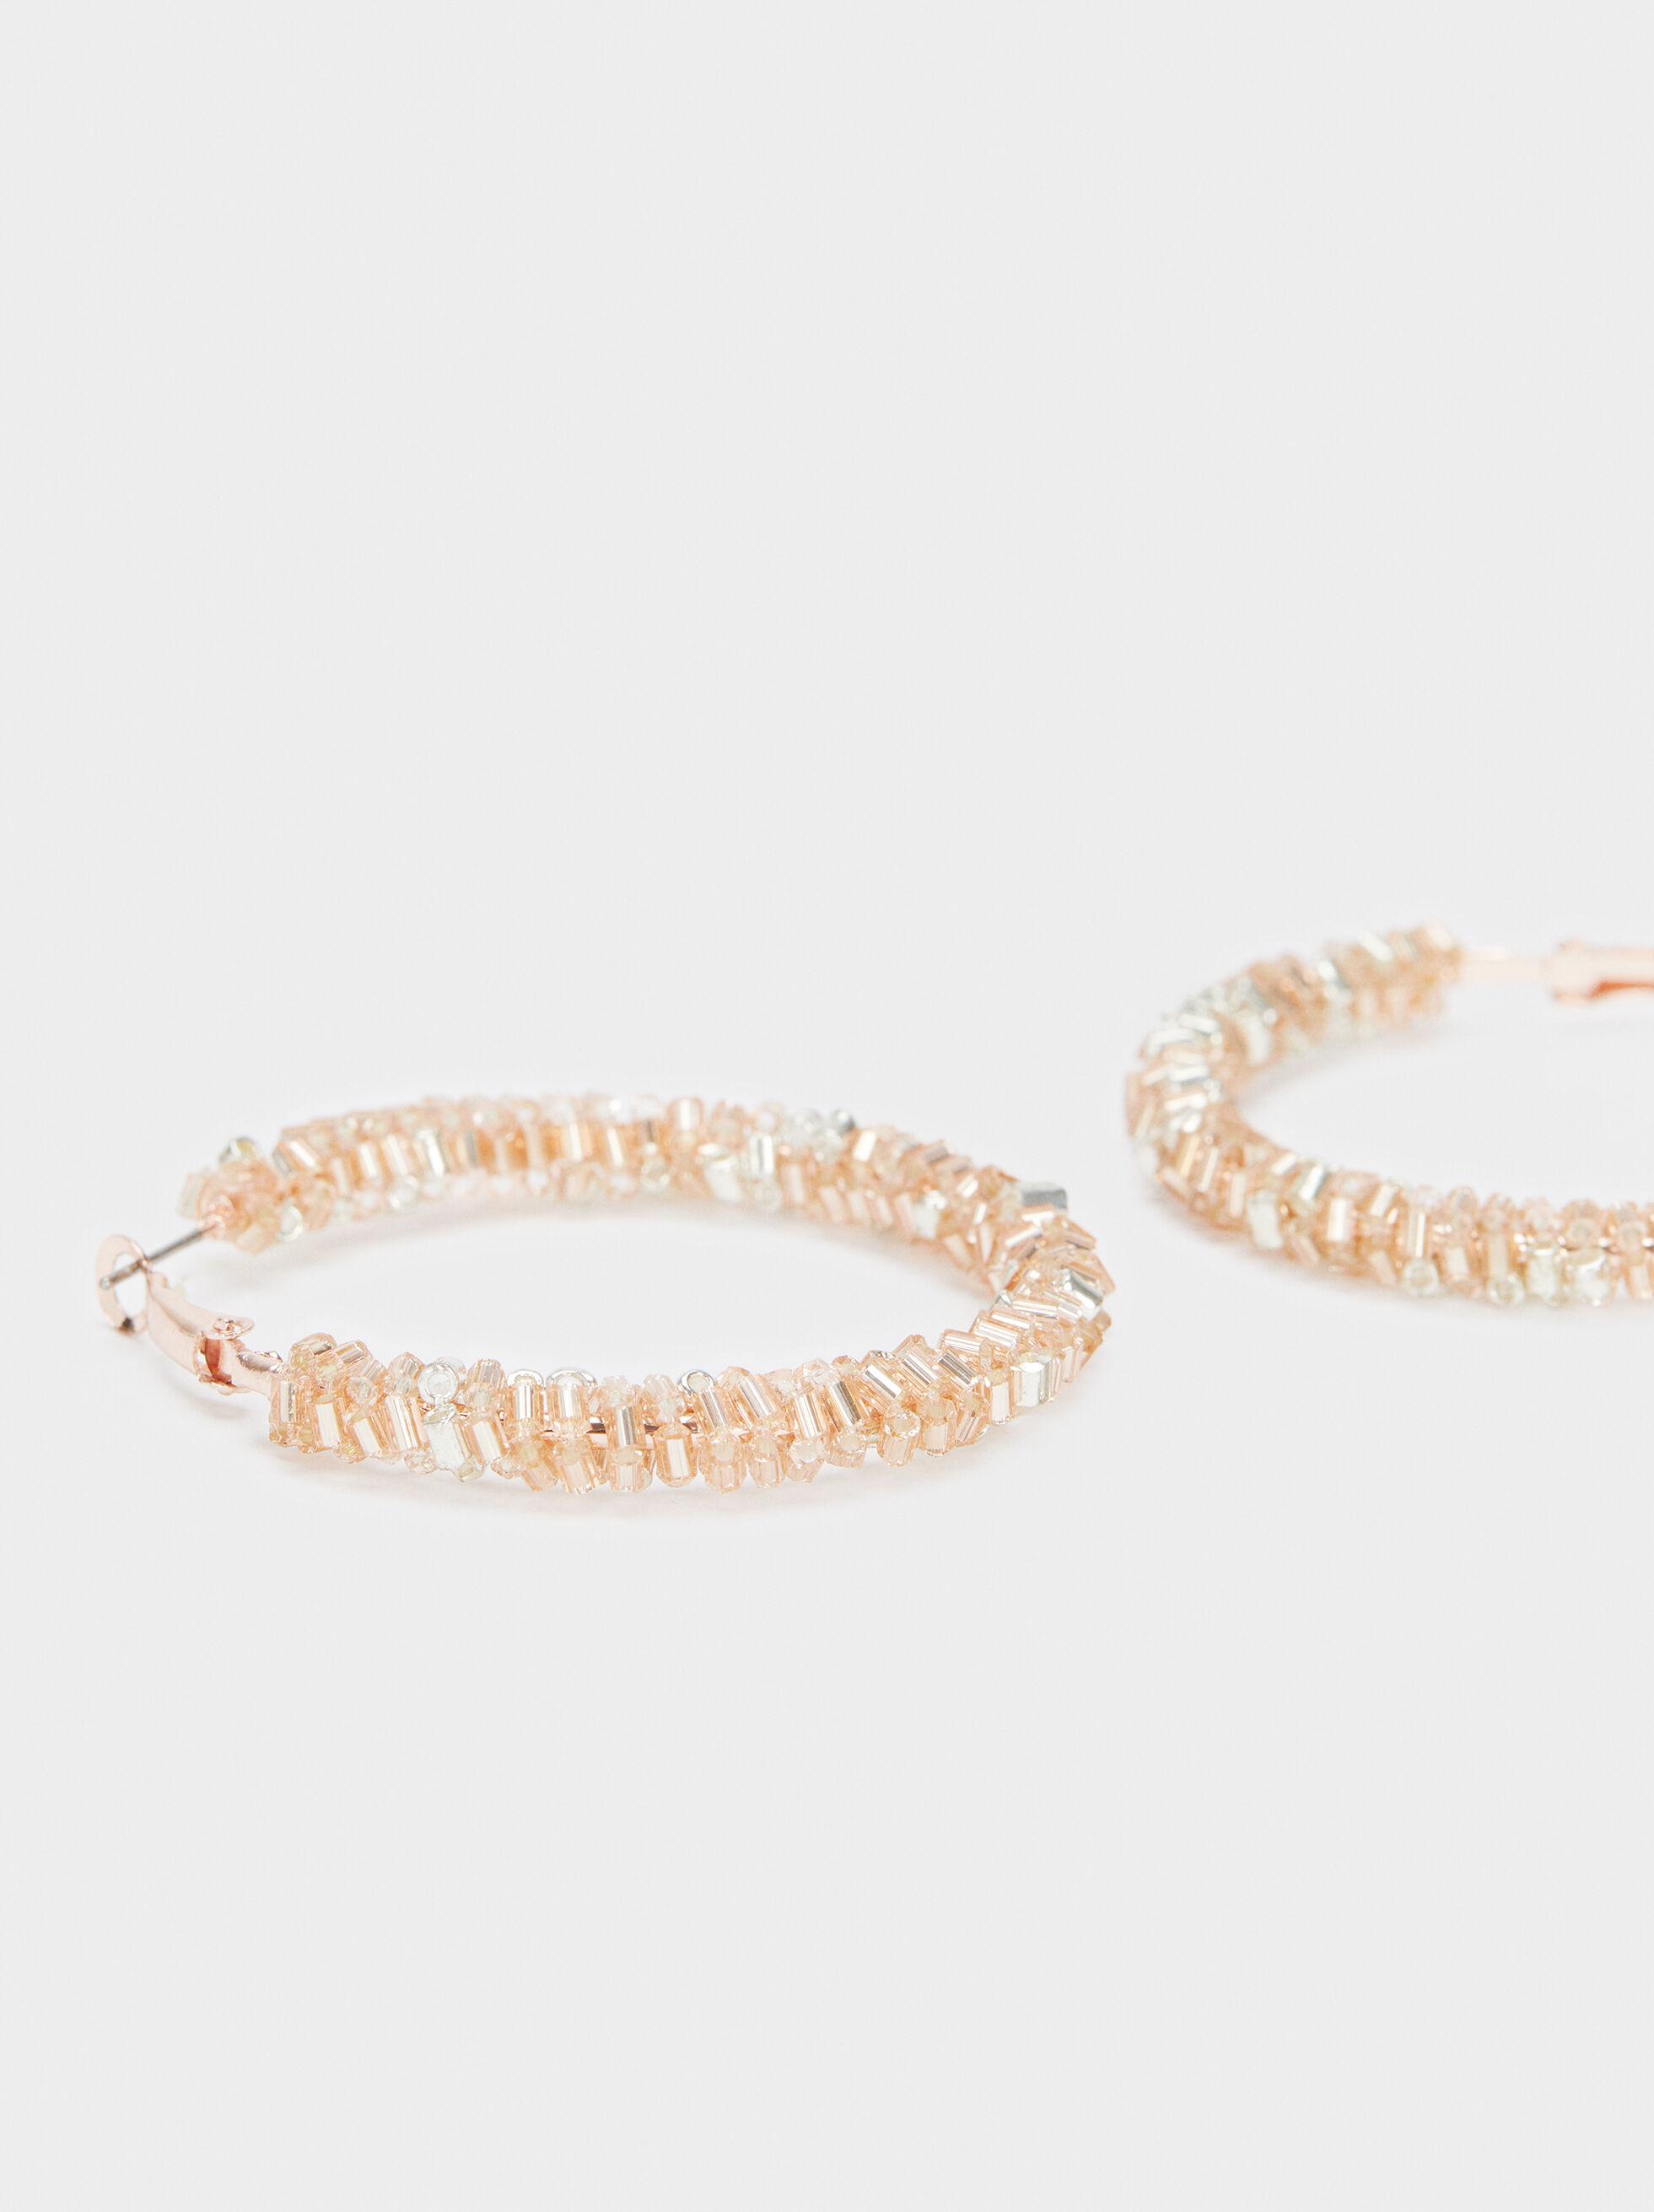 Medium Hoop Earrings With Shiny Beading, Orange, hi-res